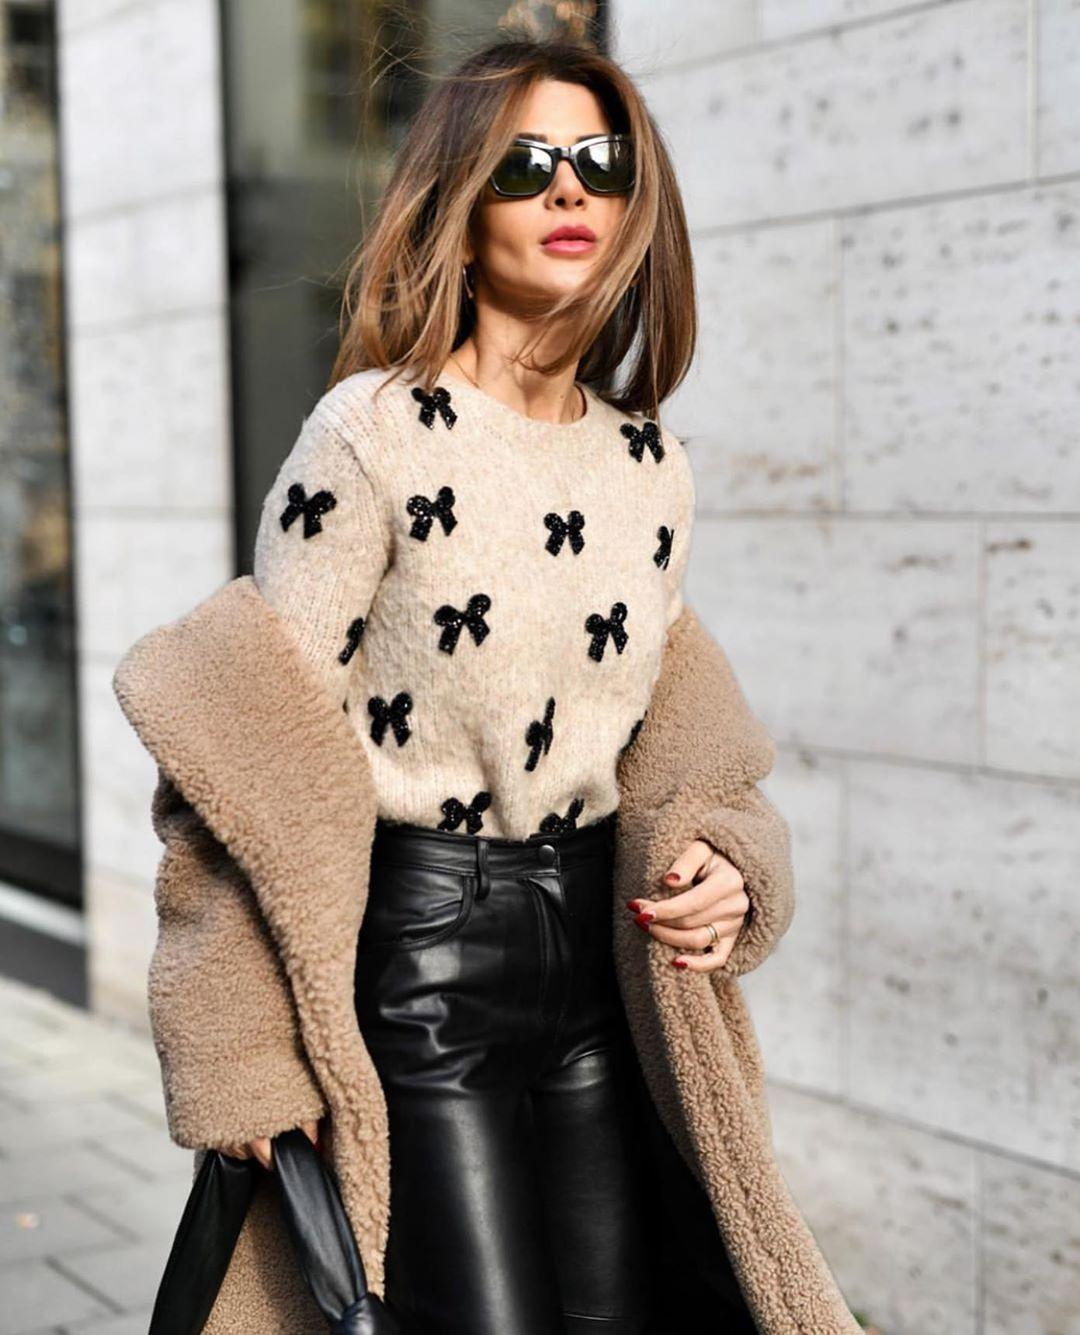 knitted sweater with bows de Zara sur zarastreetstyle